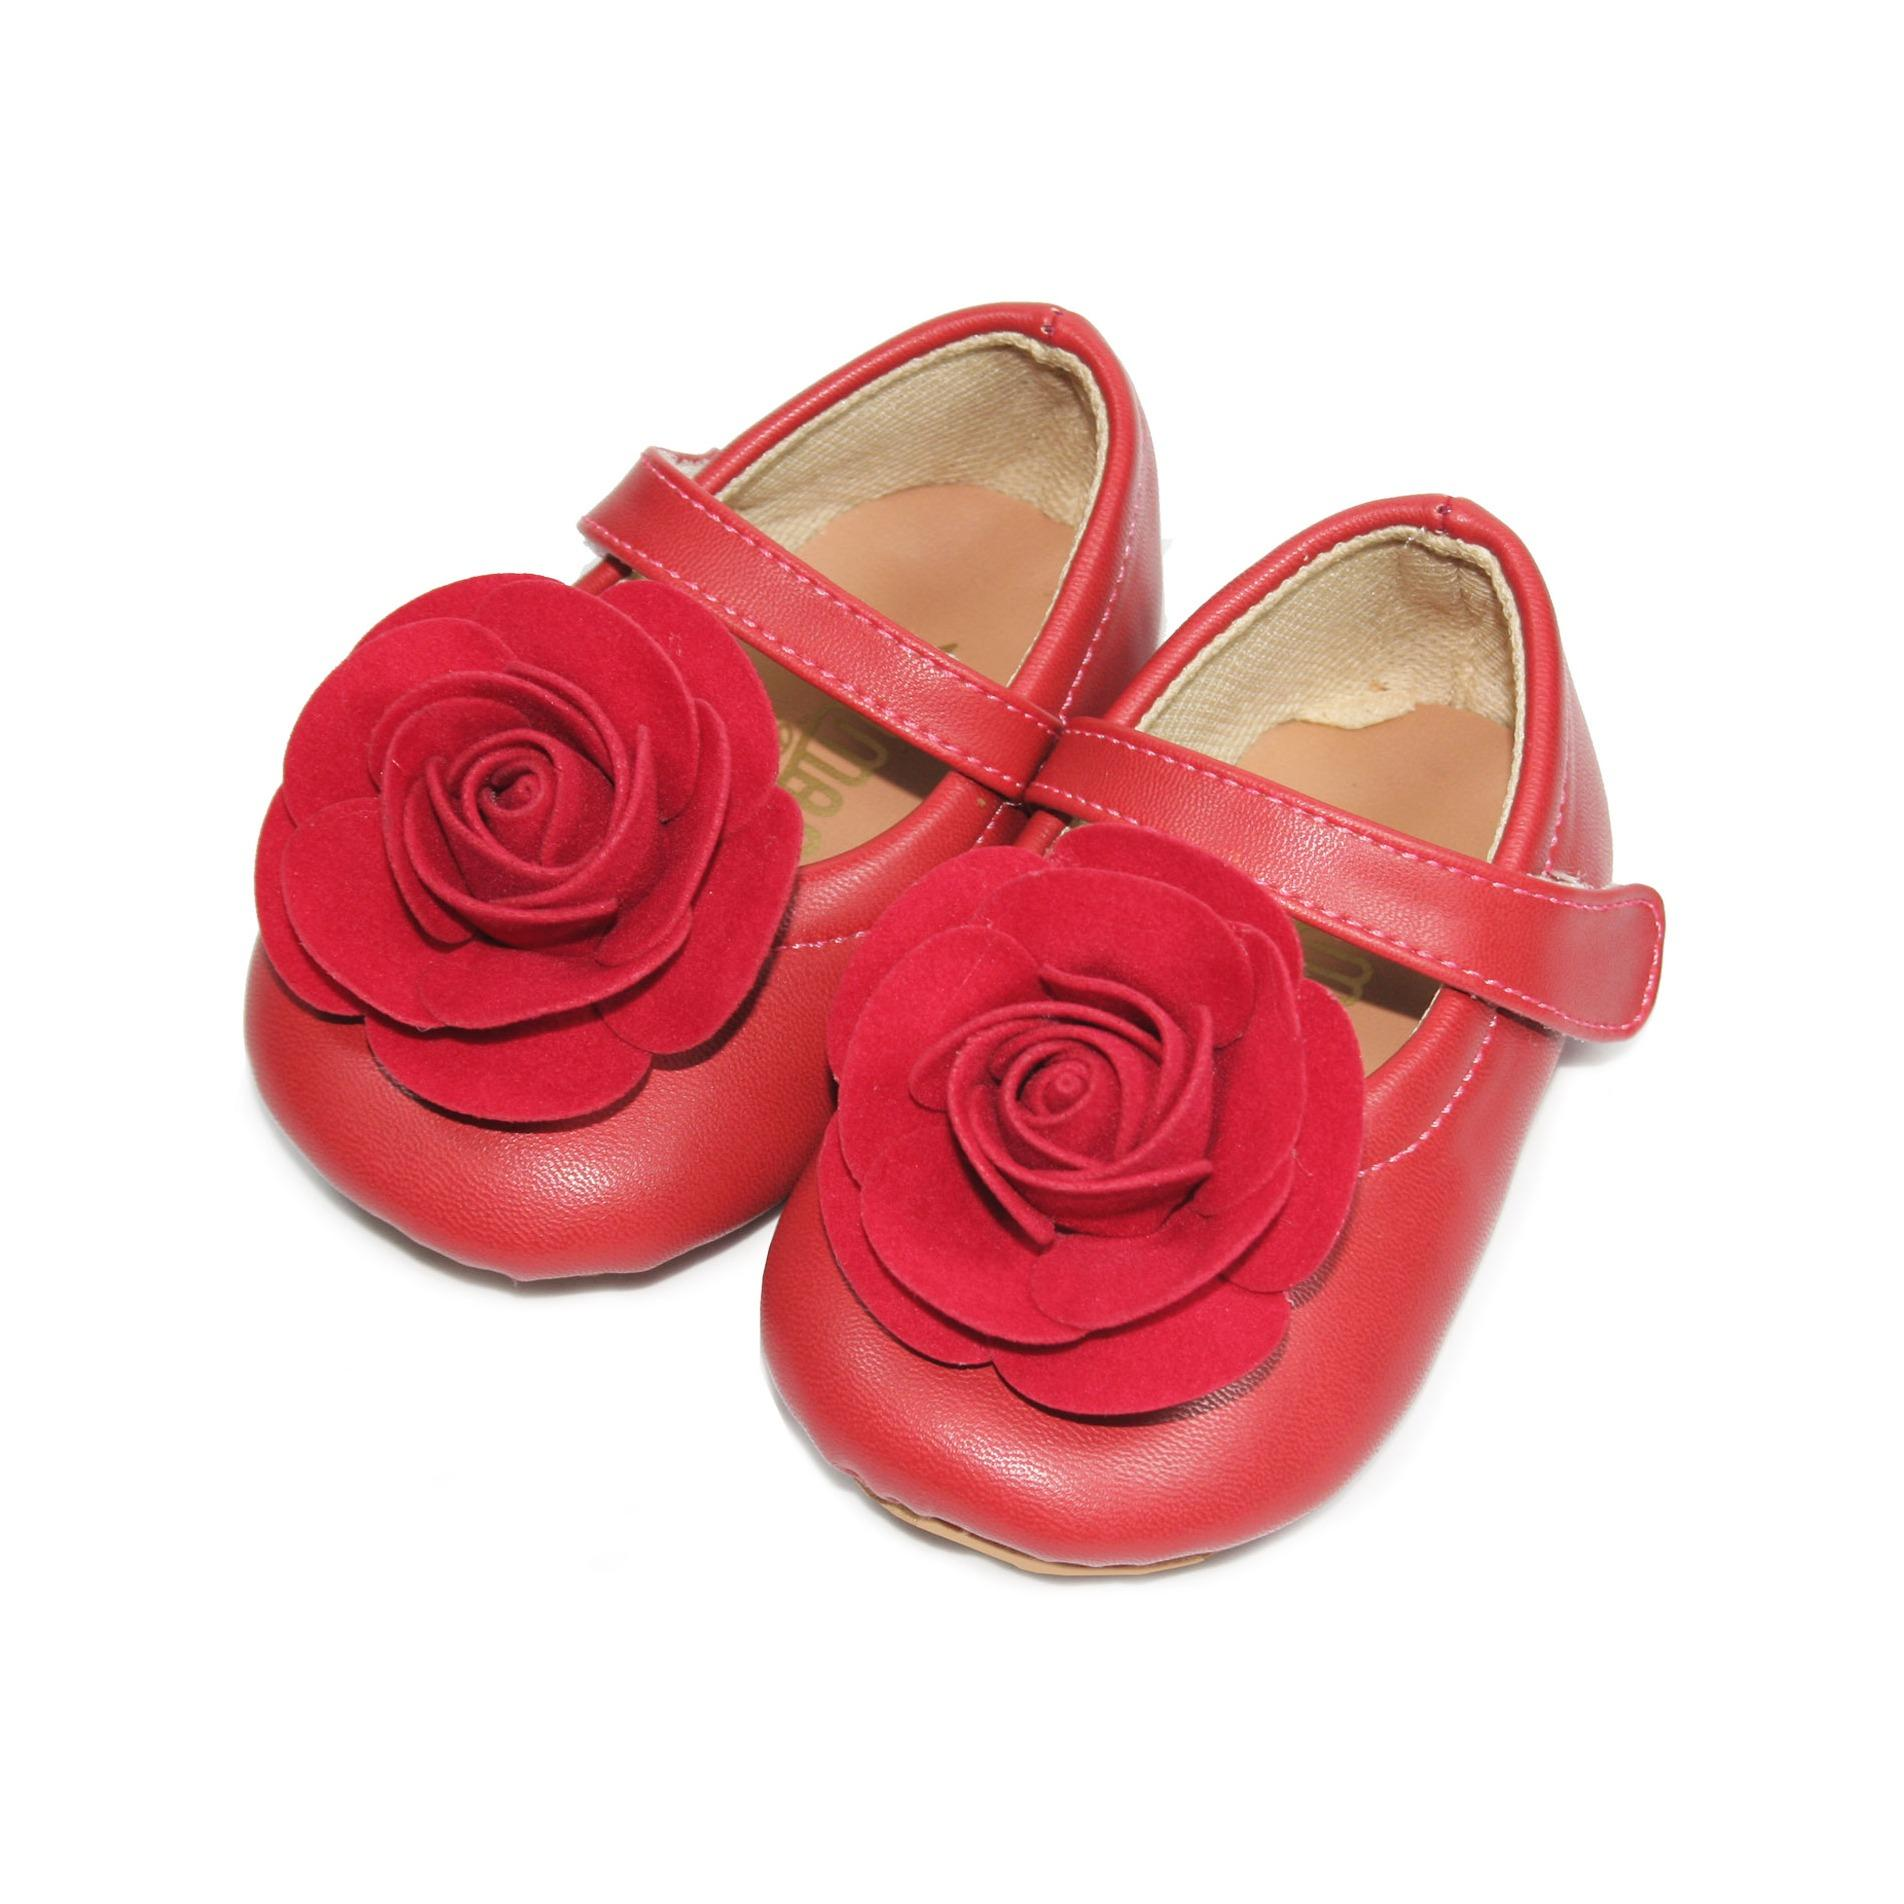 Tamagoo Sepatu Bayi Laki Baby Boy Prewalker David Blue Spec Shoes Alex Series  3 6 Bulan Abu Muda Perempuan Gwen Red Rose